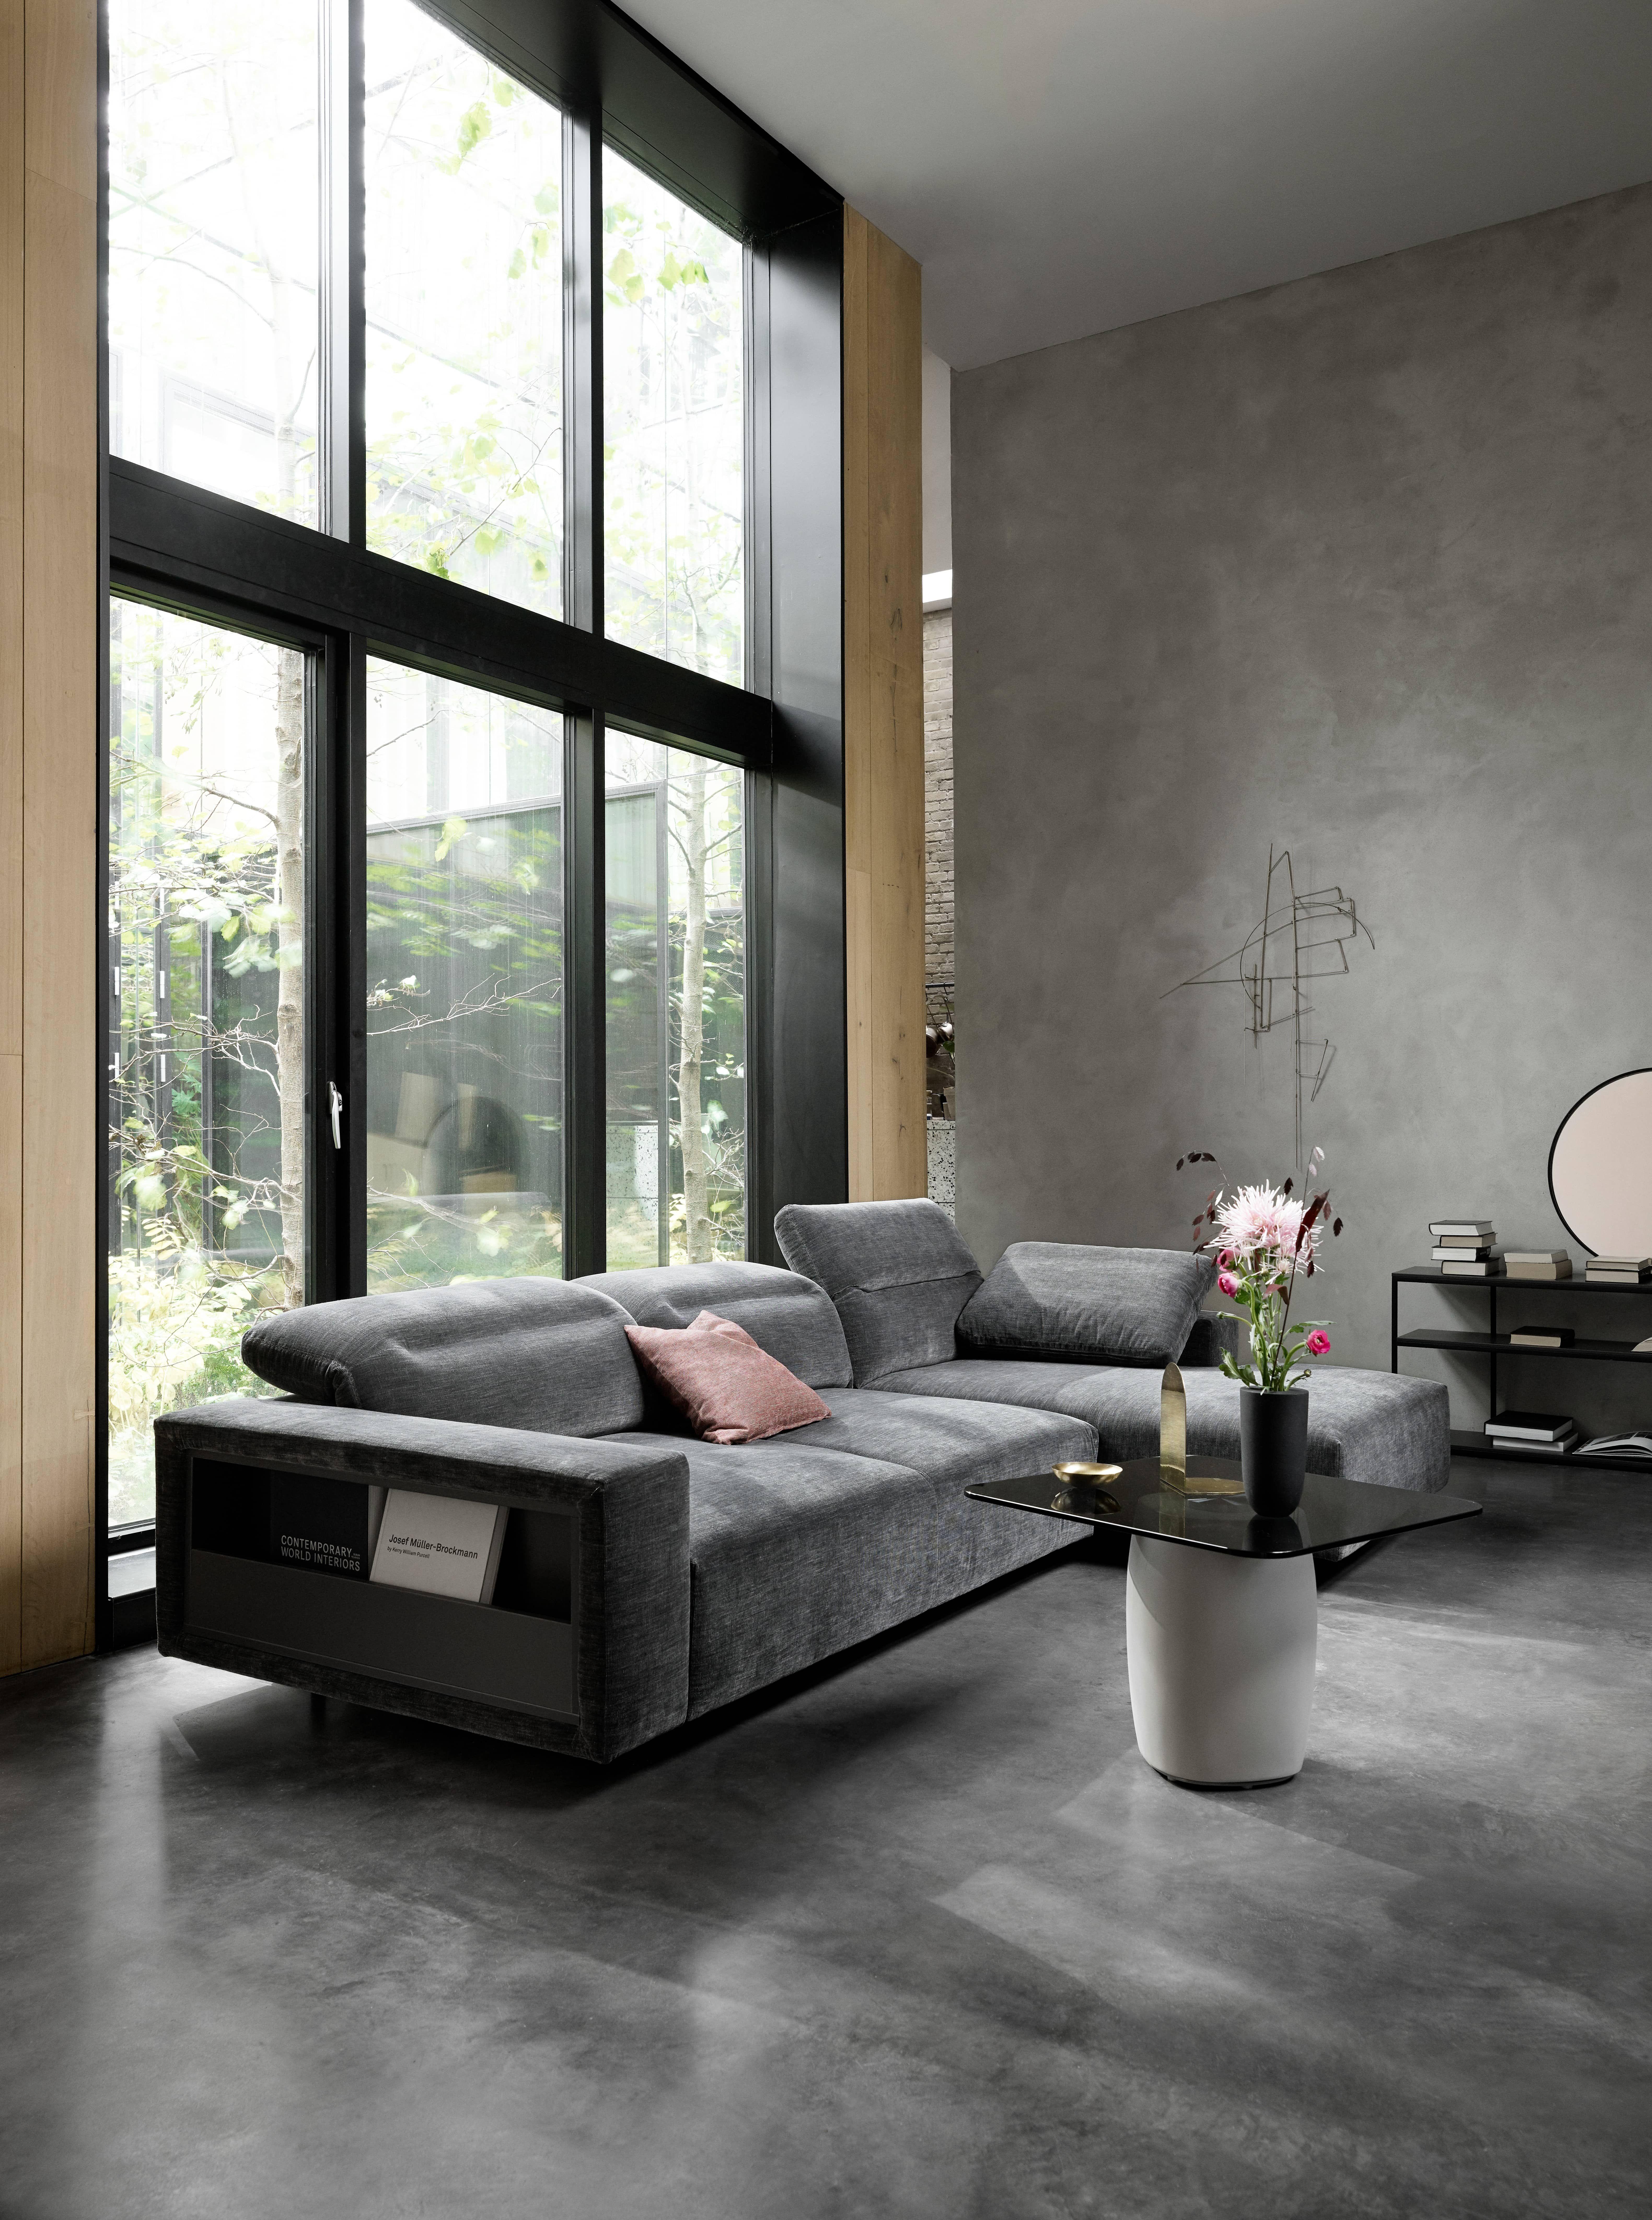 hampton sofa mit bilbao couchtisch boconcept interiordesign design interiors living. Black Bedroom Furniture Sets. Home Design Ideas